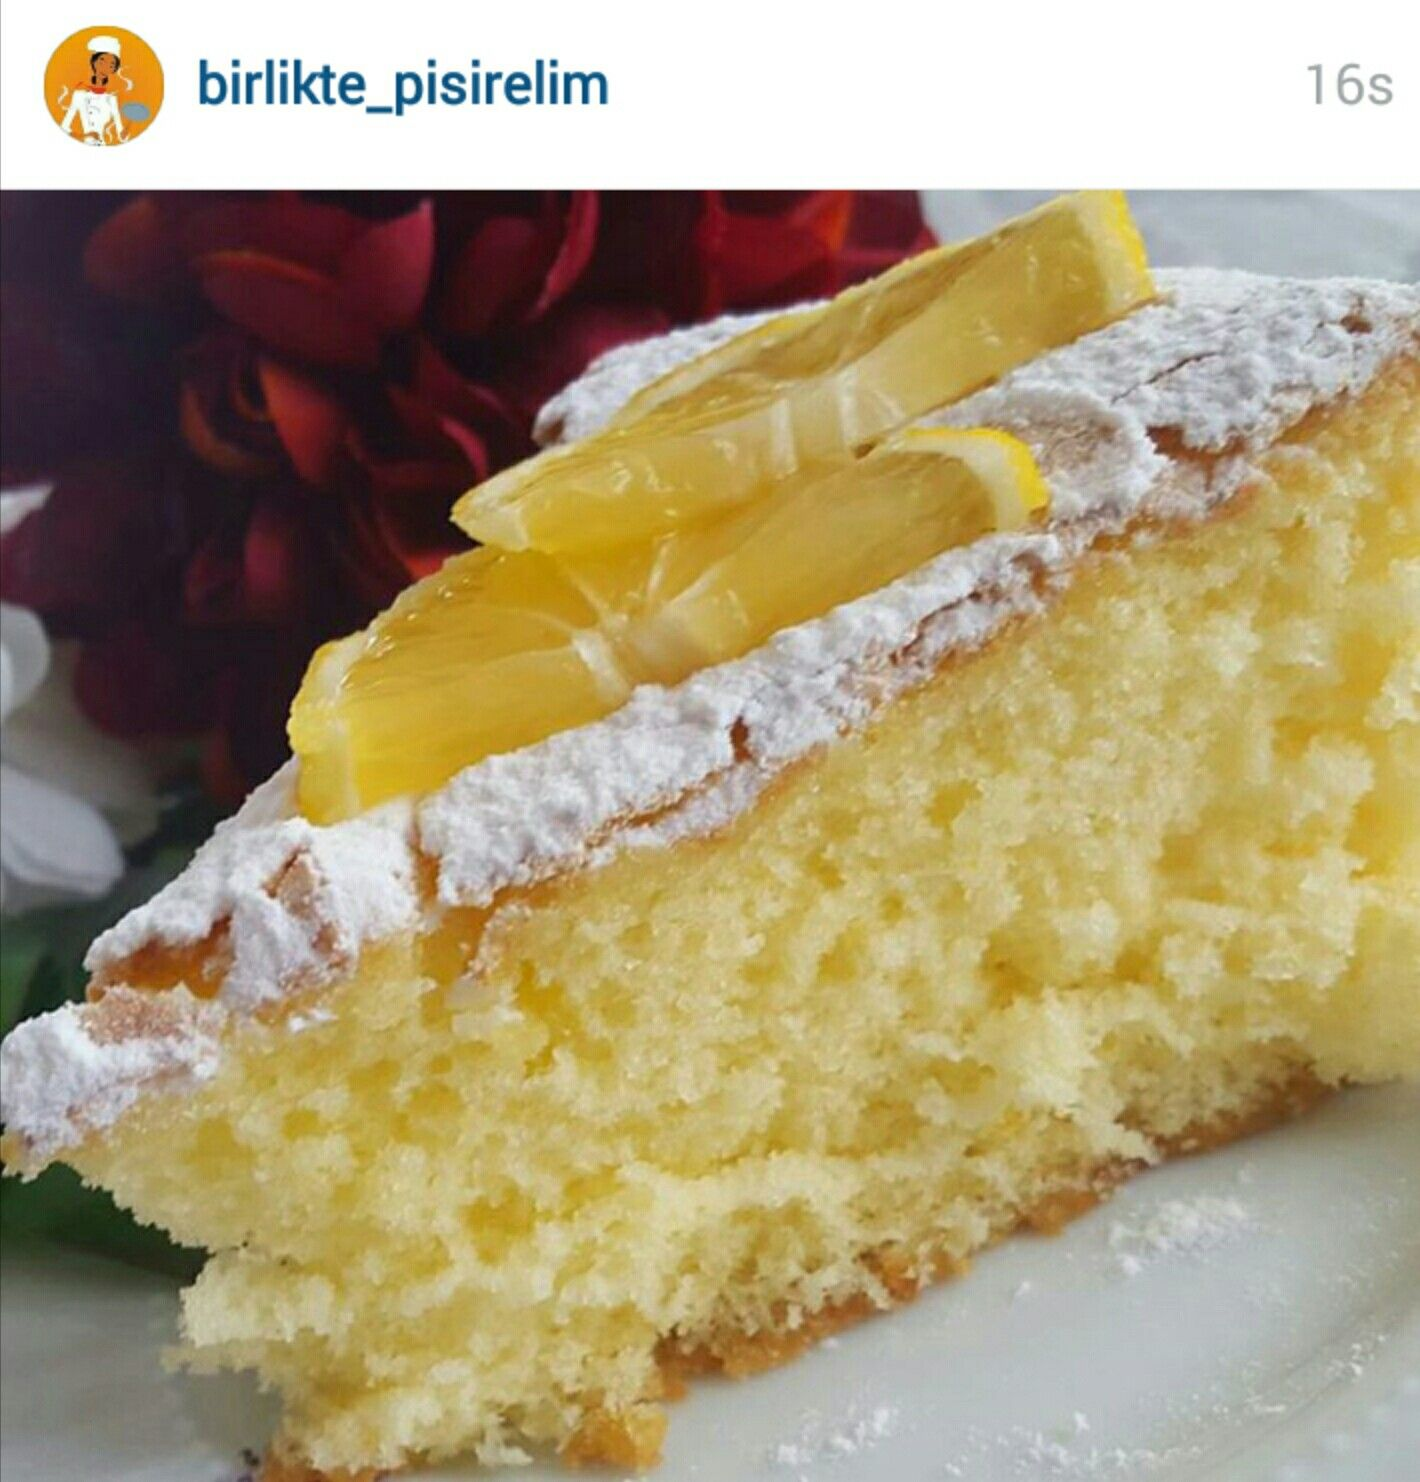 Limonlu Nişastalı Kek